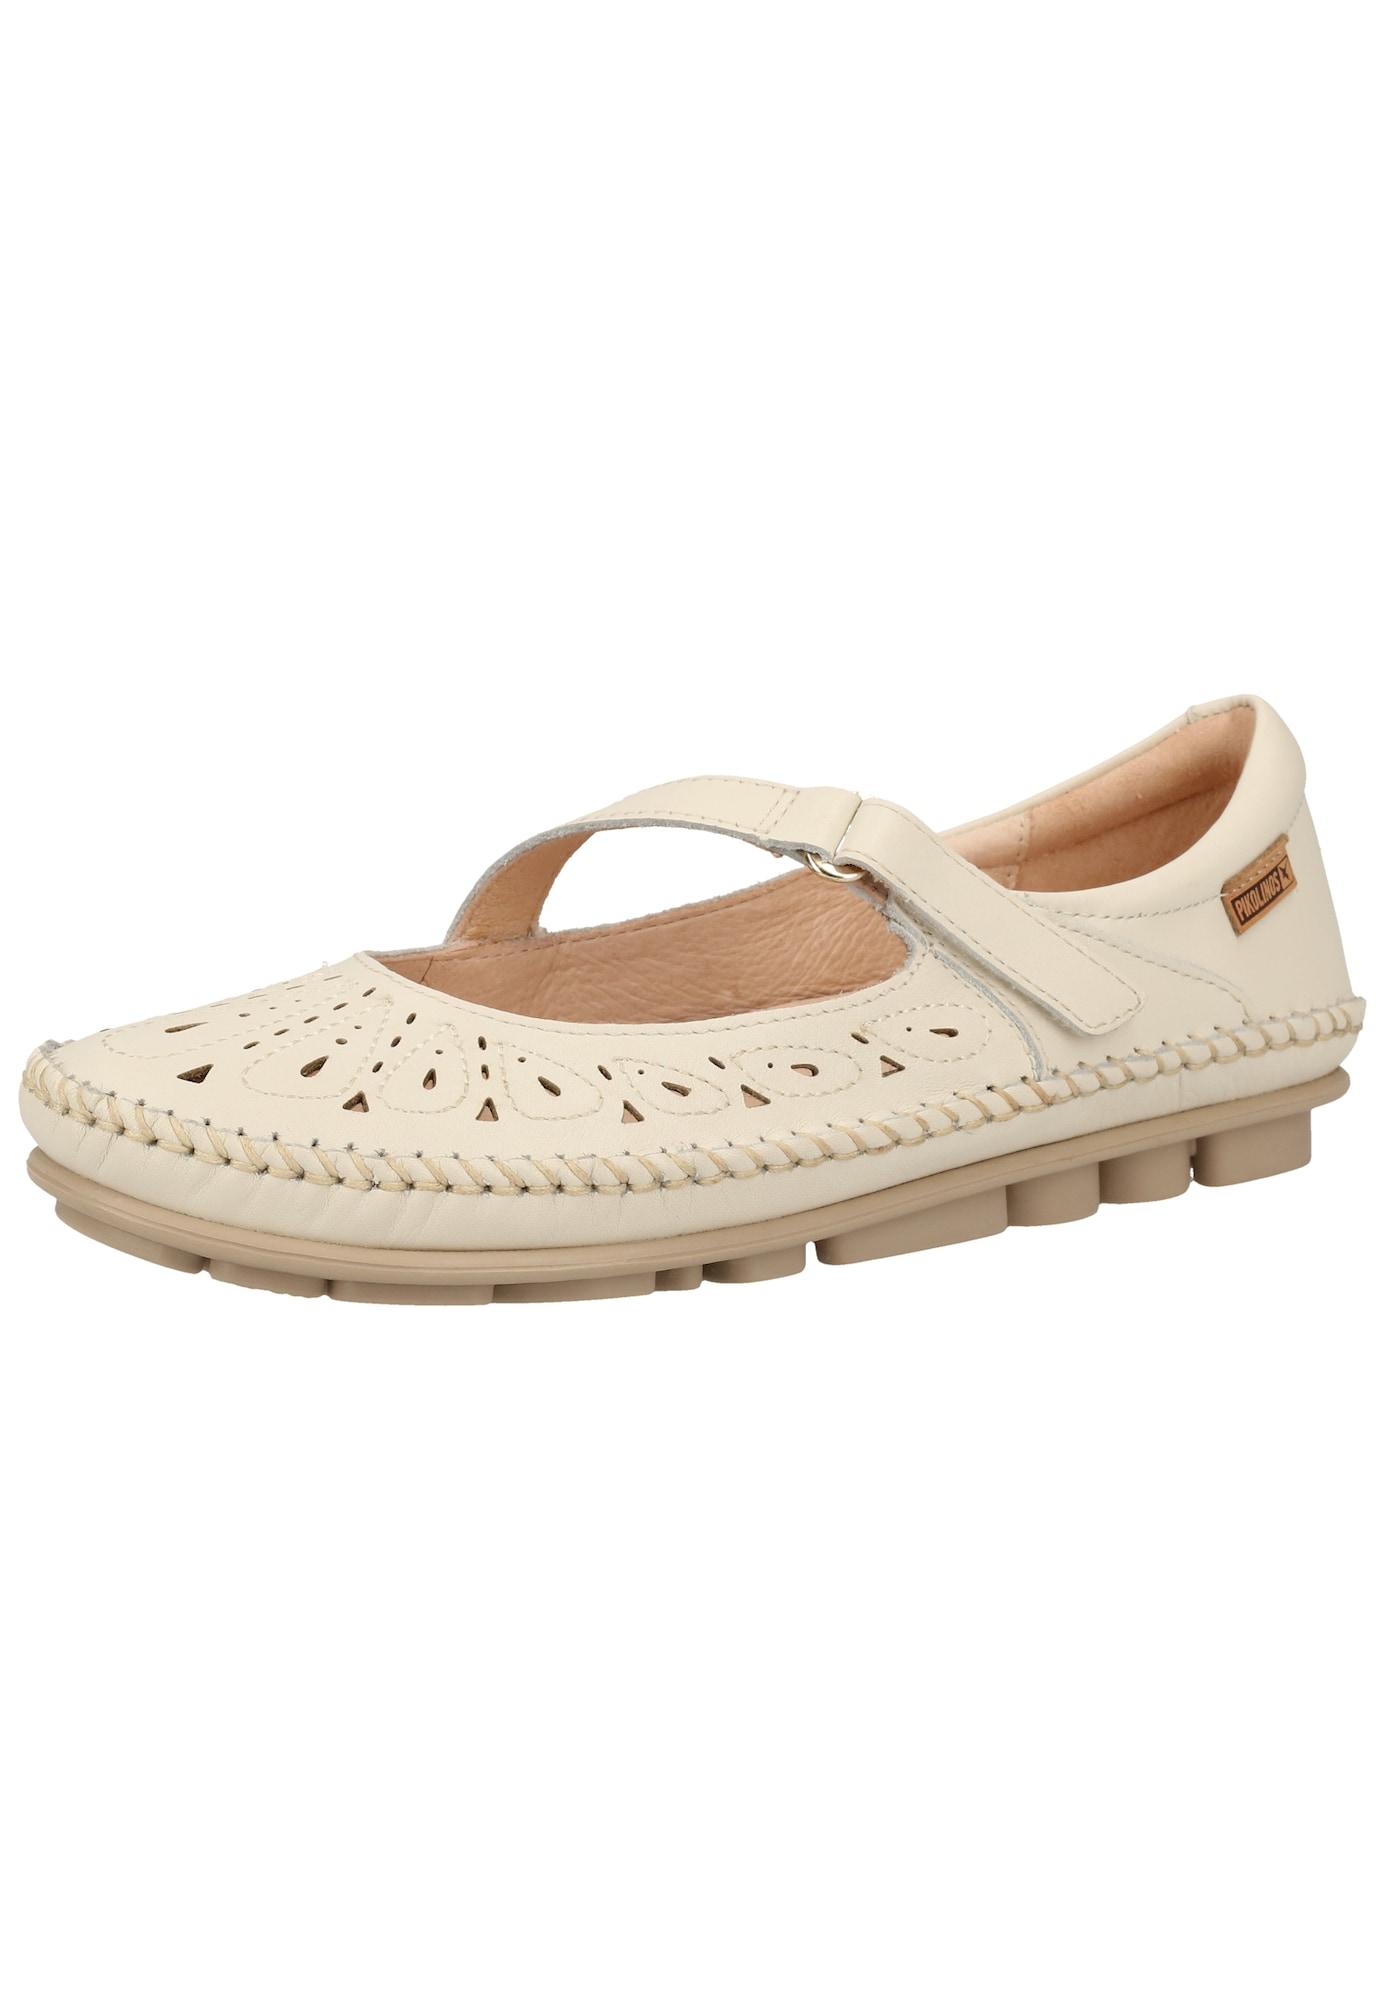 Riemchenballerina | Schuhe > Ballerinas > Riemchenballerinas | Pikolinos